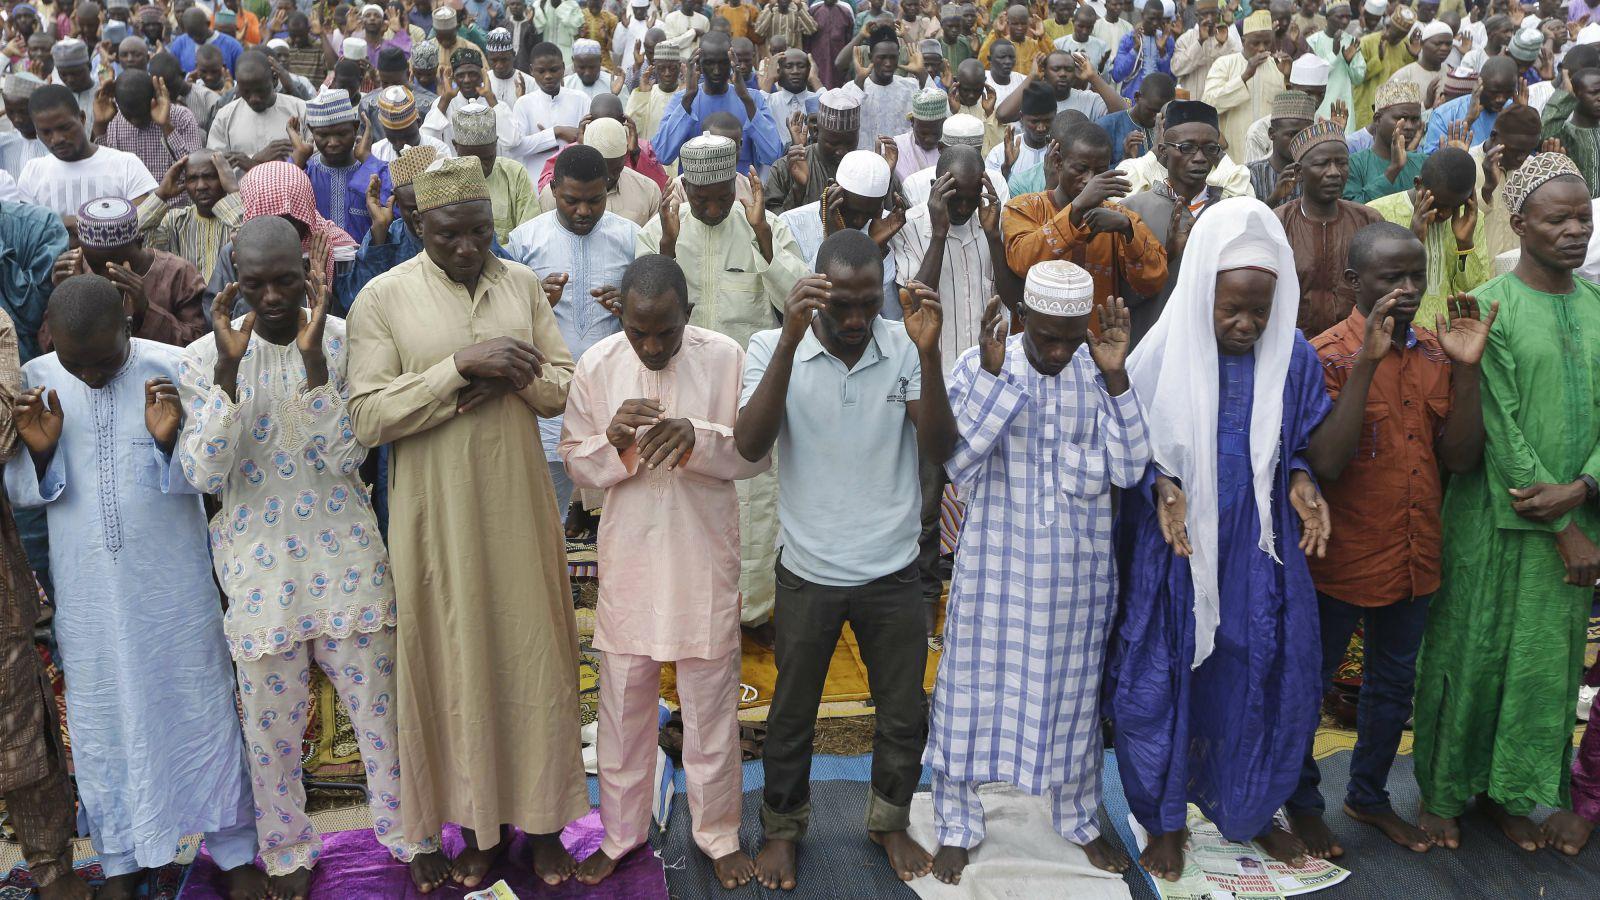 Muslims advised to sustain religious piety after Ramadan